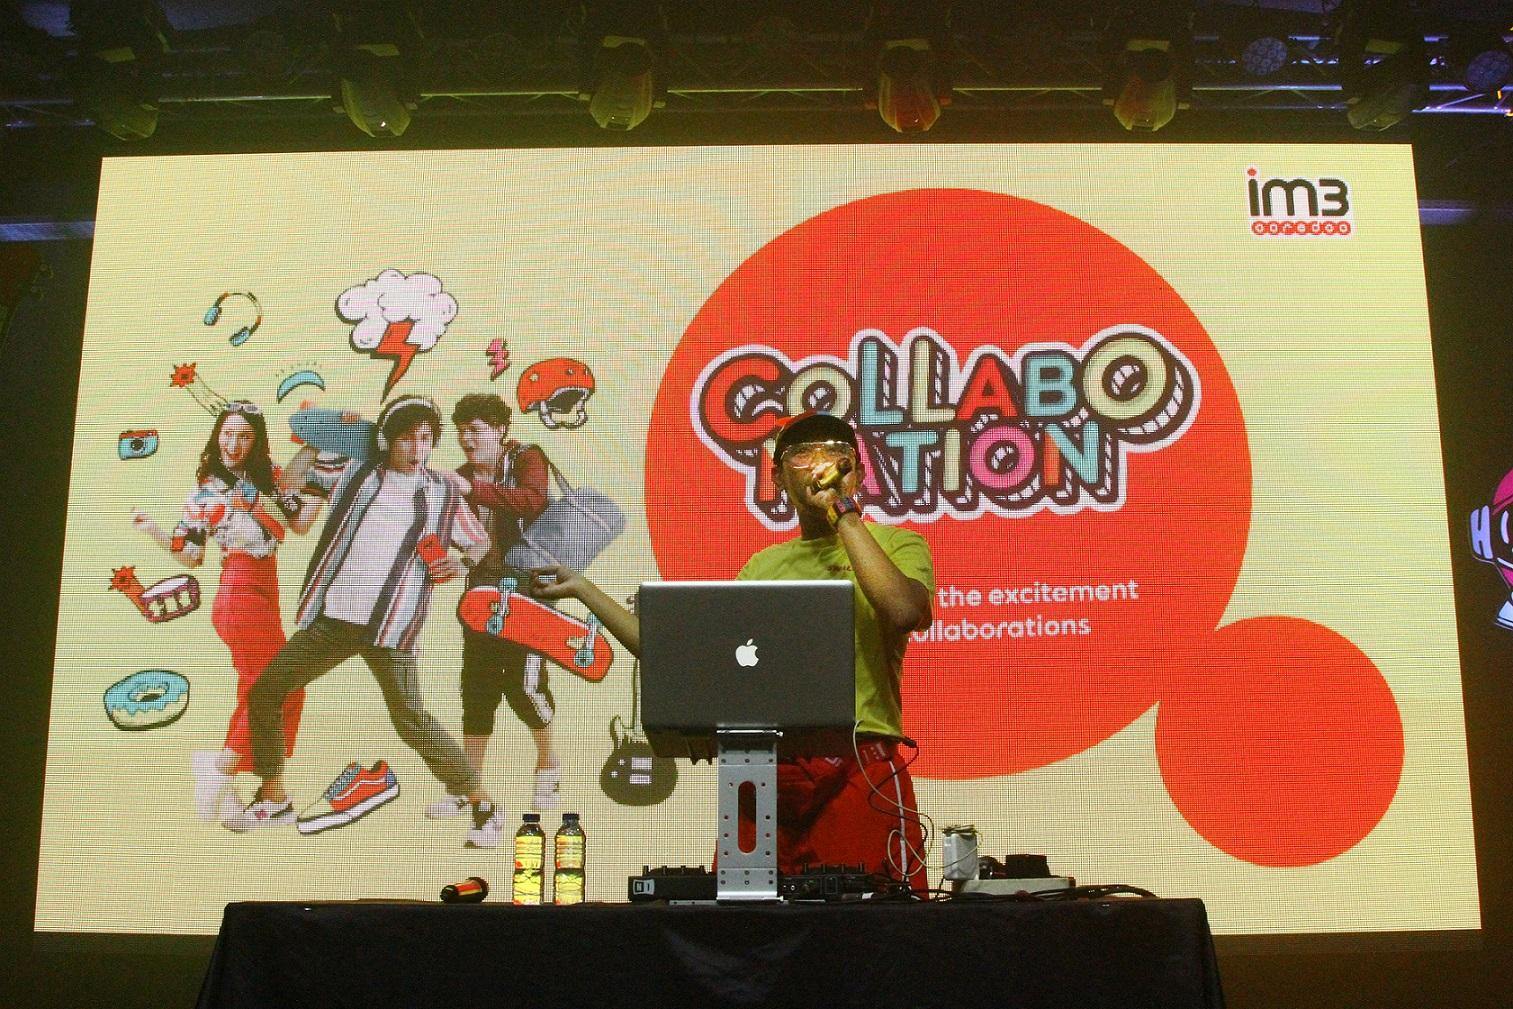 Collabonation, IM3 Ooredoo, podcast, KOLABORASI